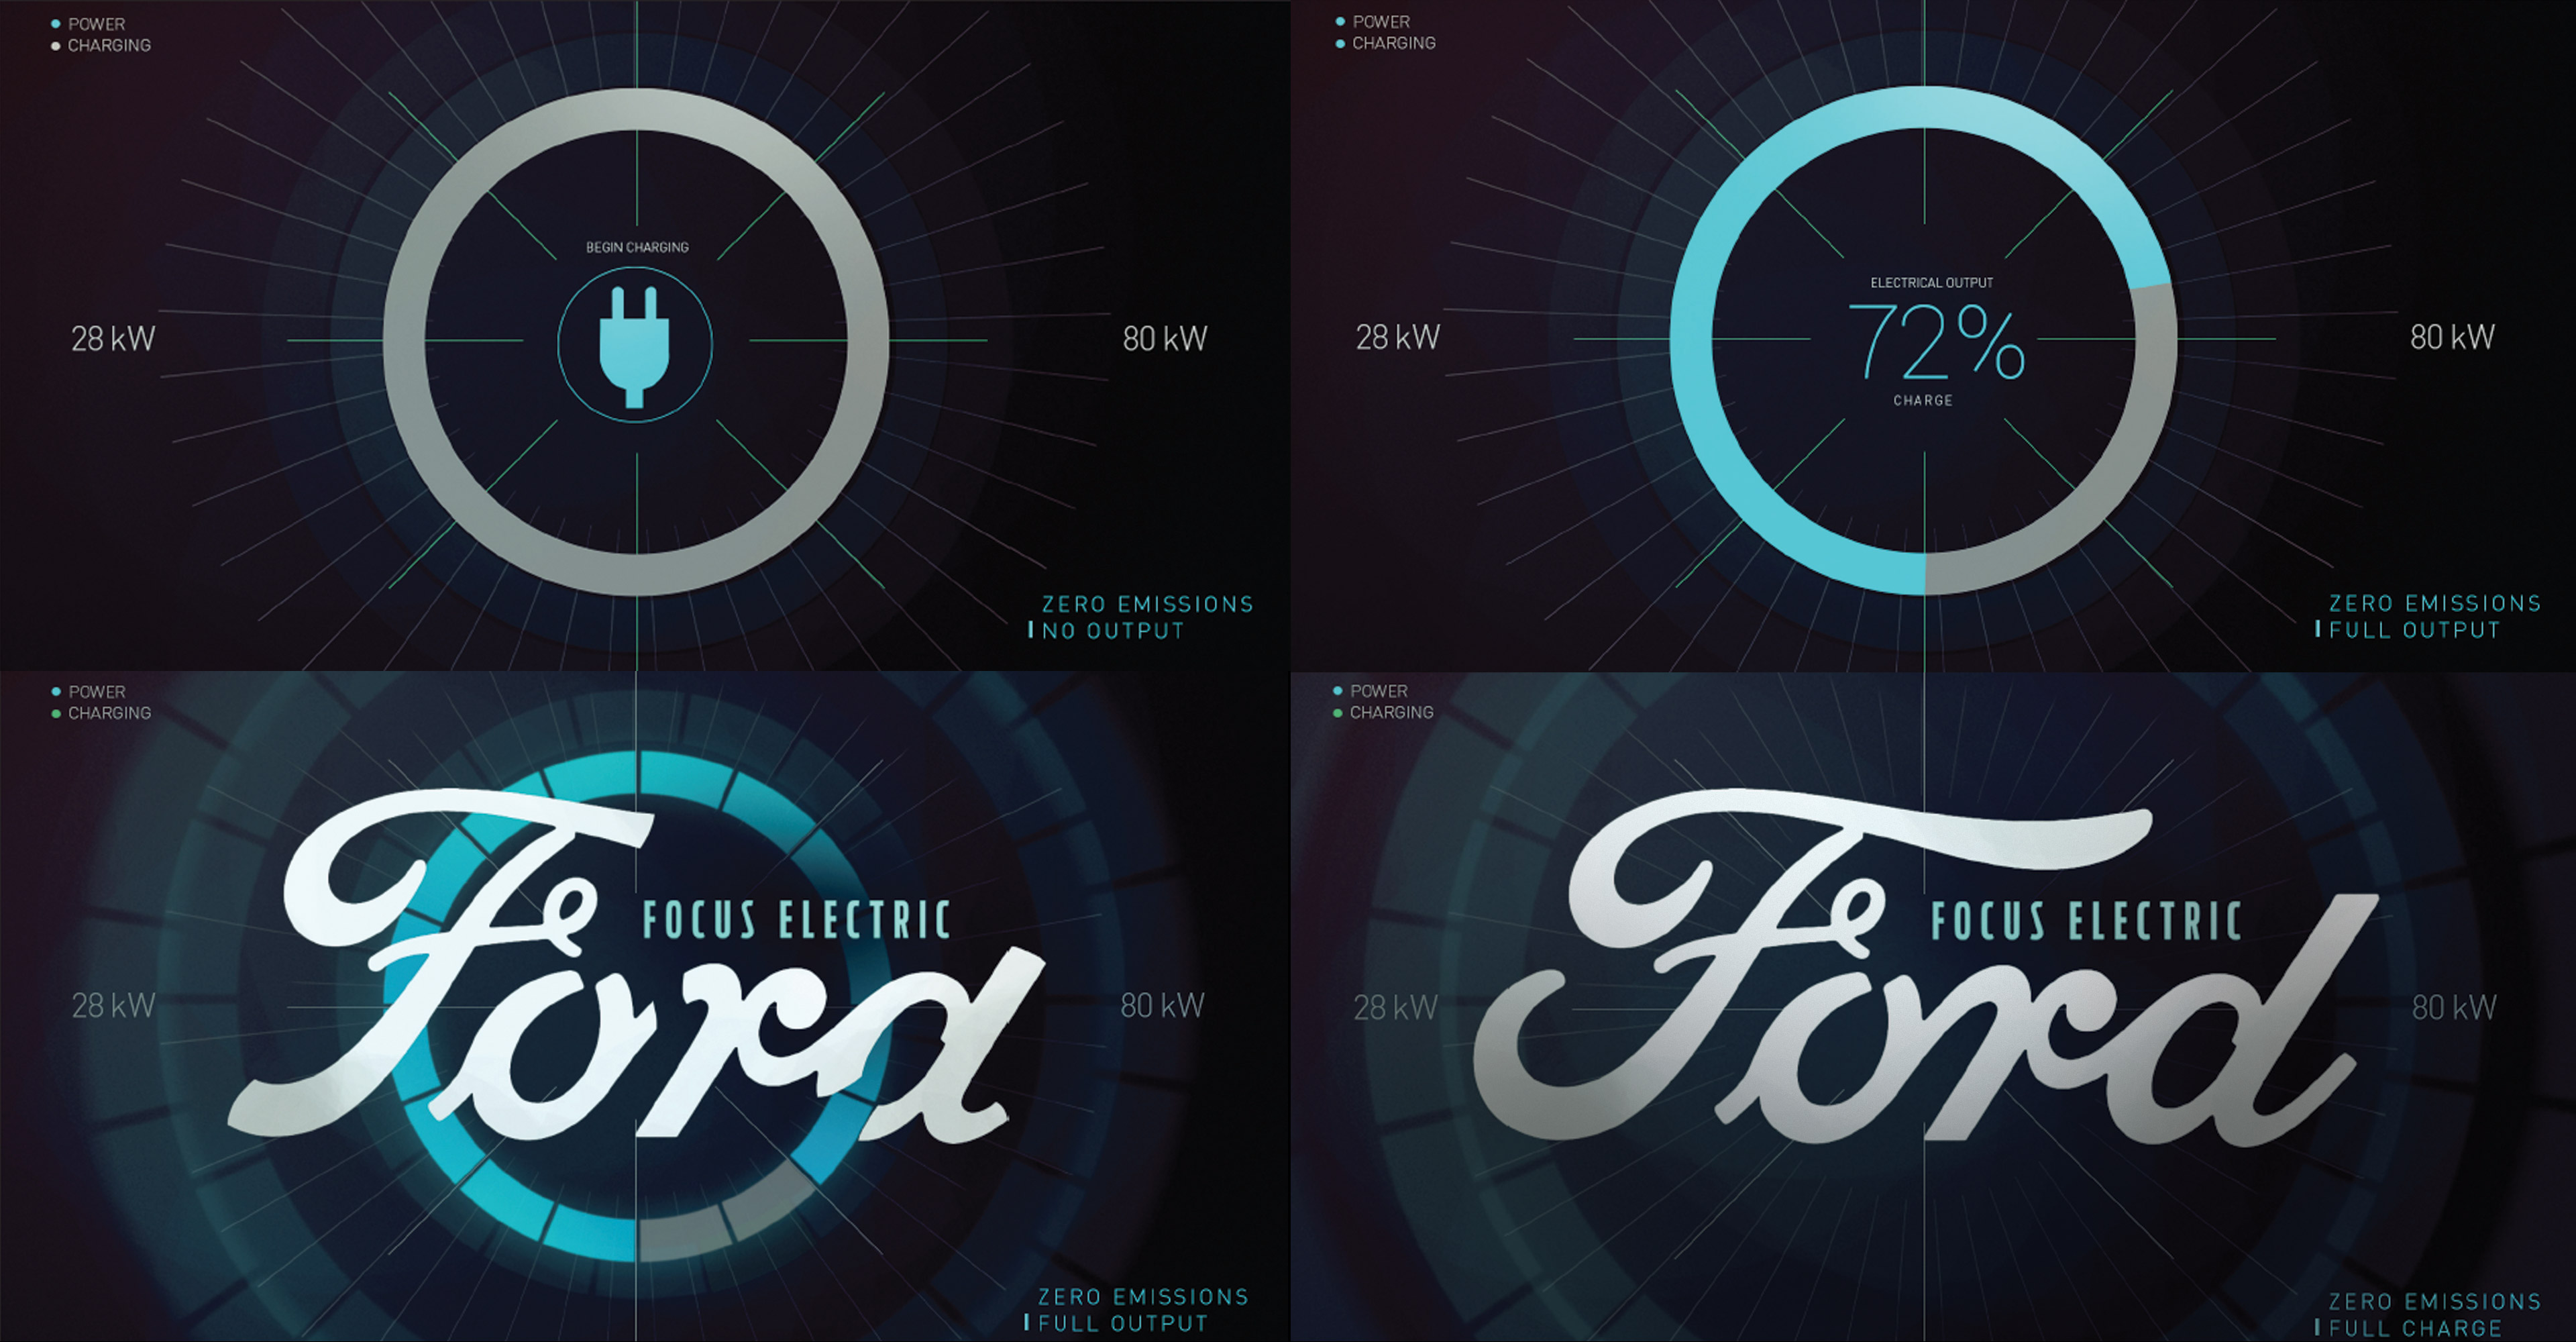 Ford_Design-Frames